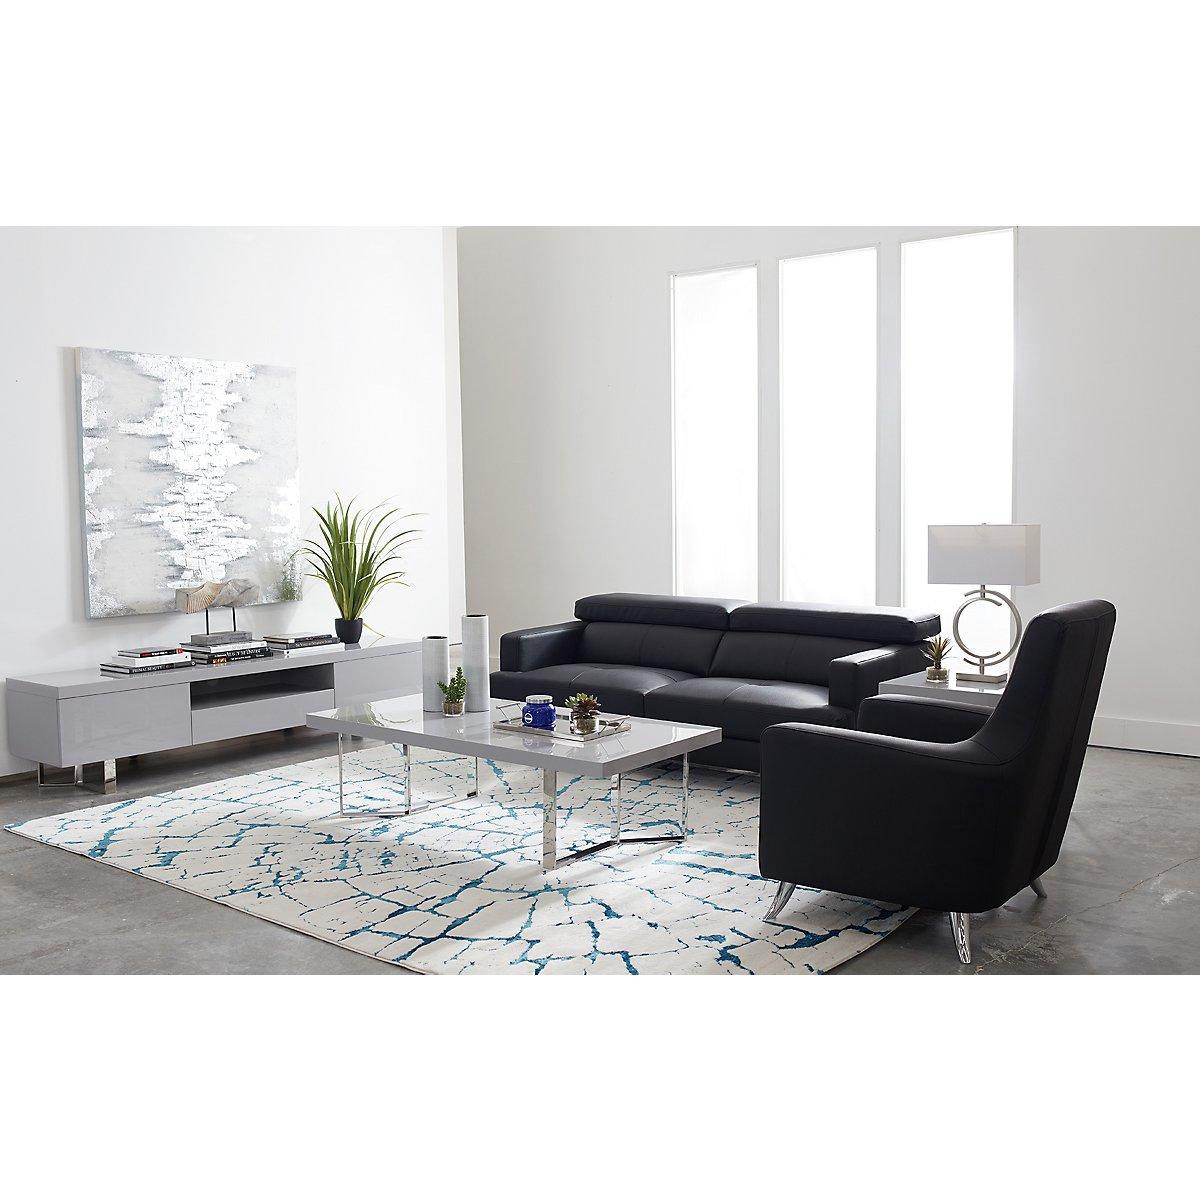 City Furniture: Marquez Black Microfiber 8-Piece Living Room Package